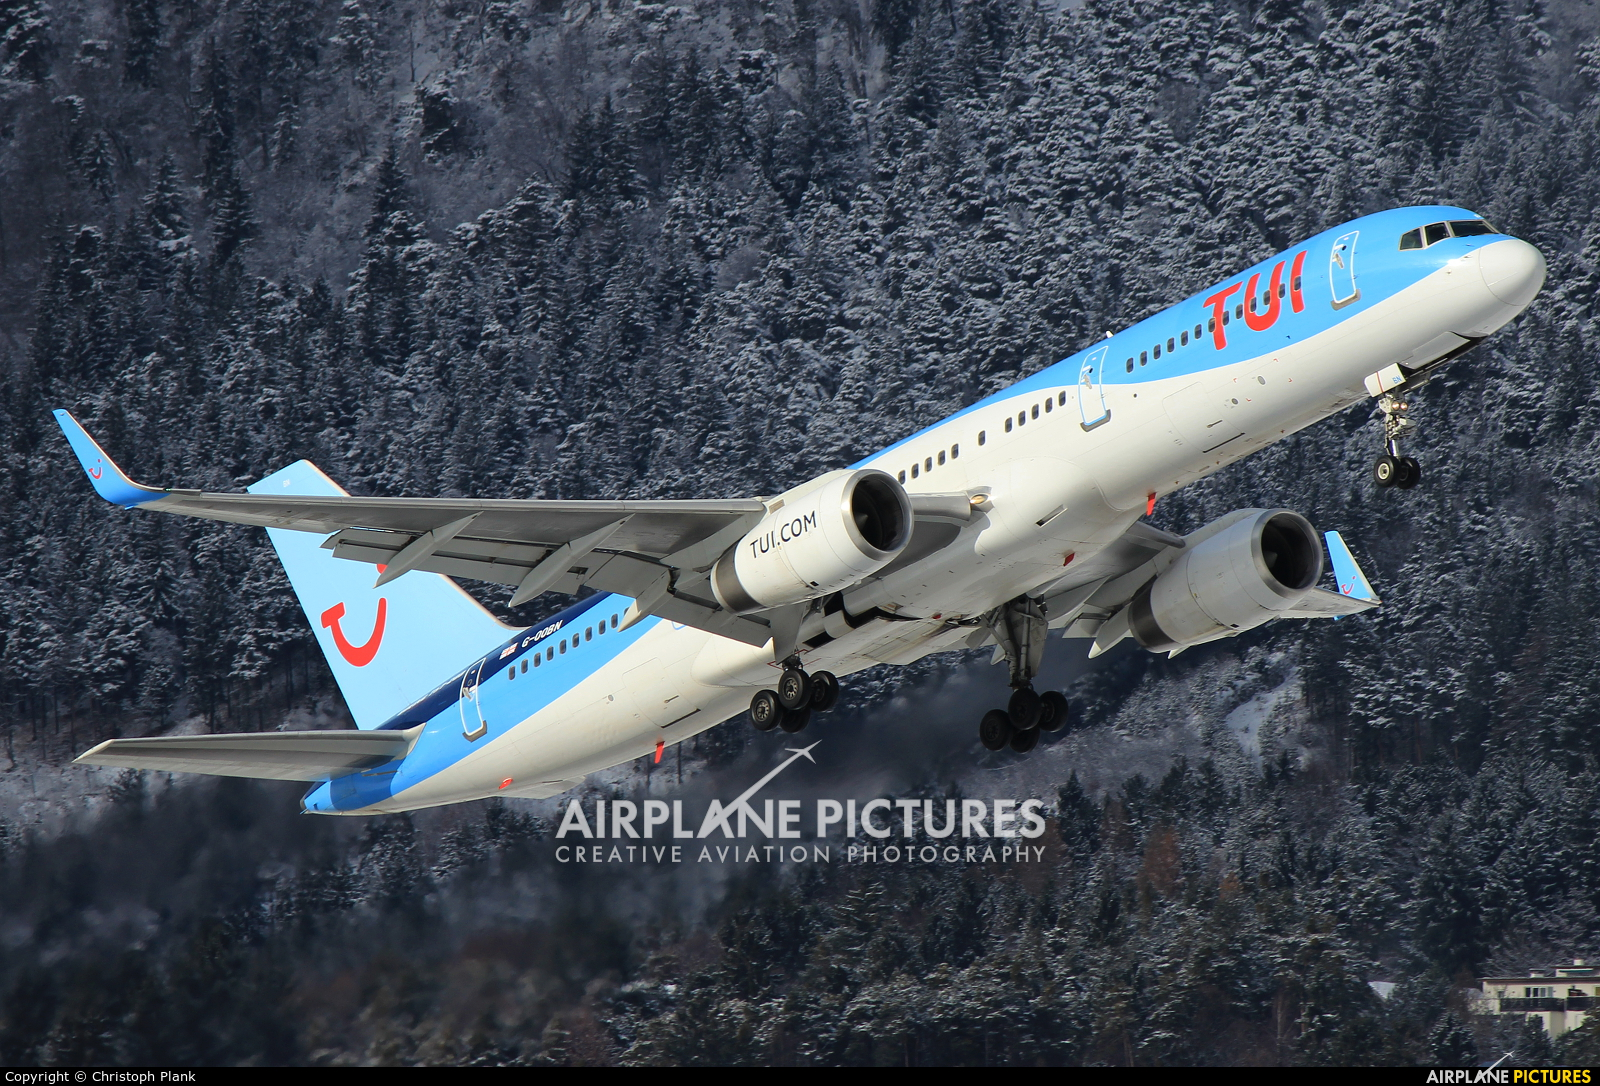 TUI Airways G-OOBN aircraft at Innsbruck